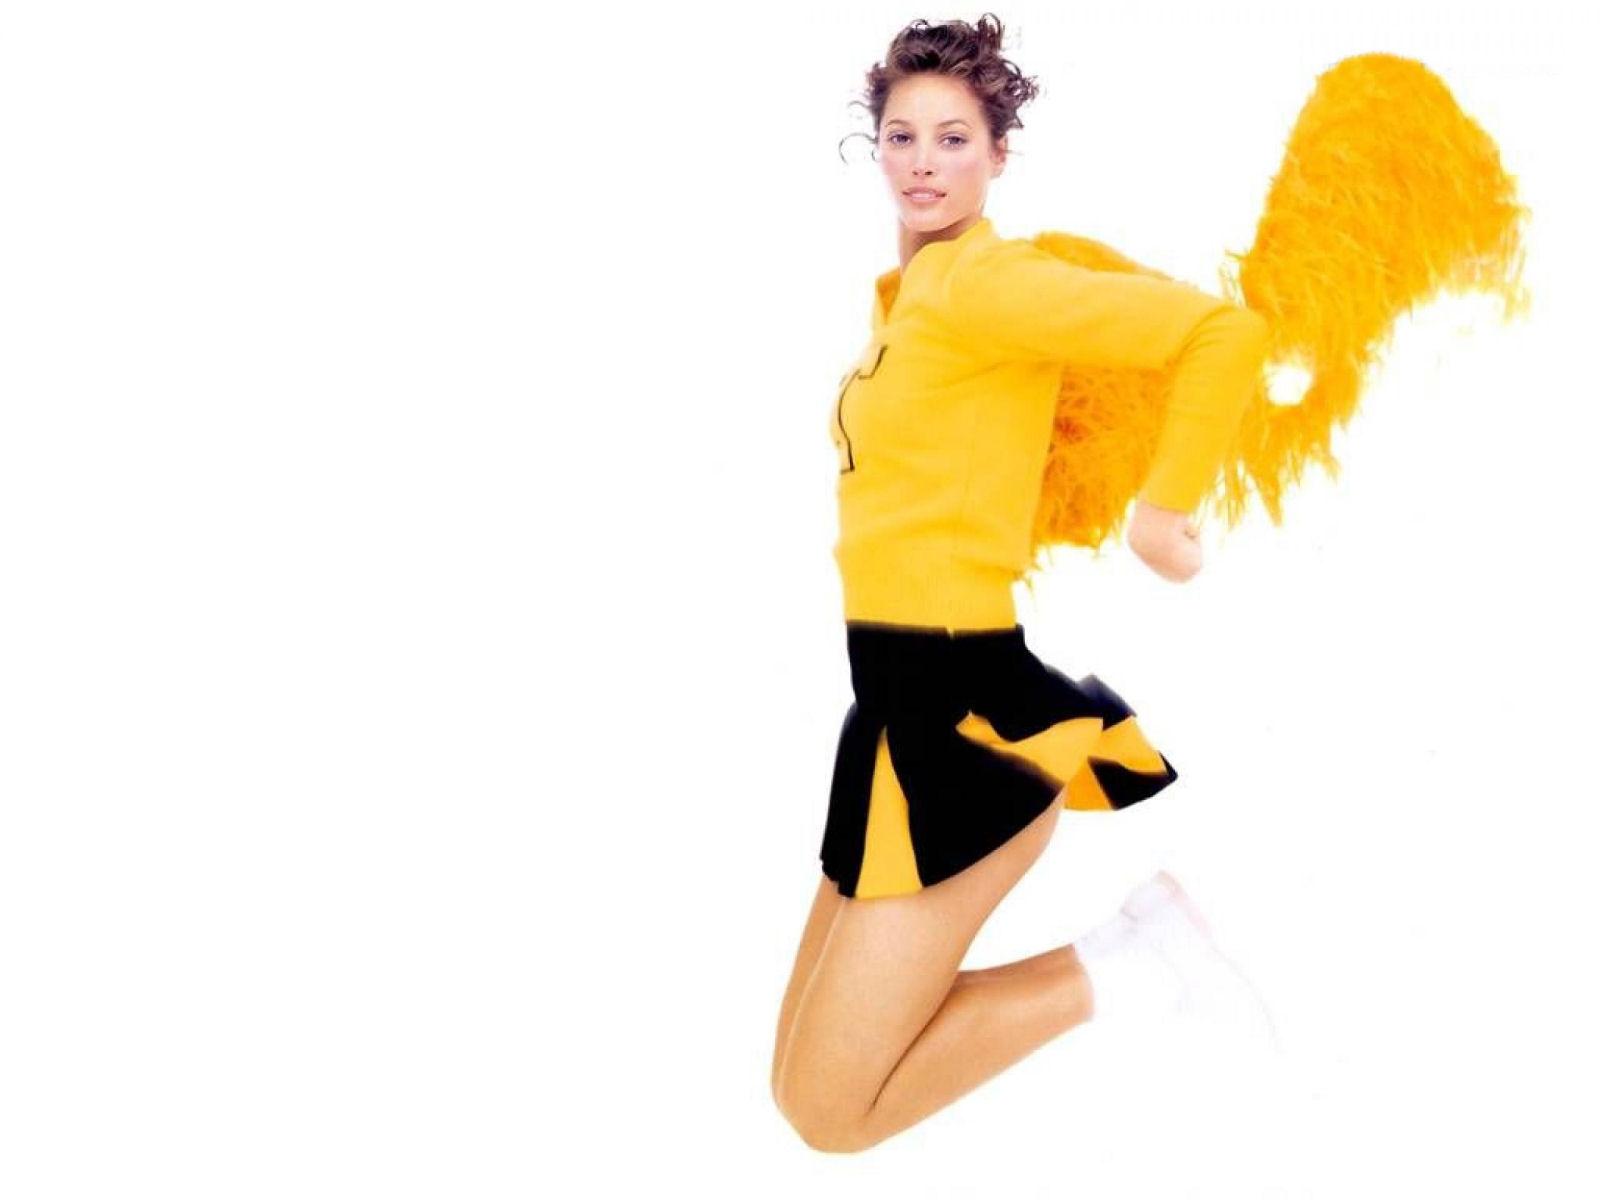 cheerleader wallpaper hd Desktop Wallpaper cheerleader hd wallpaper 1600x1200